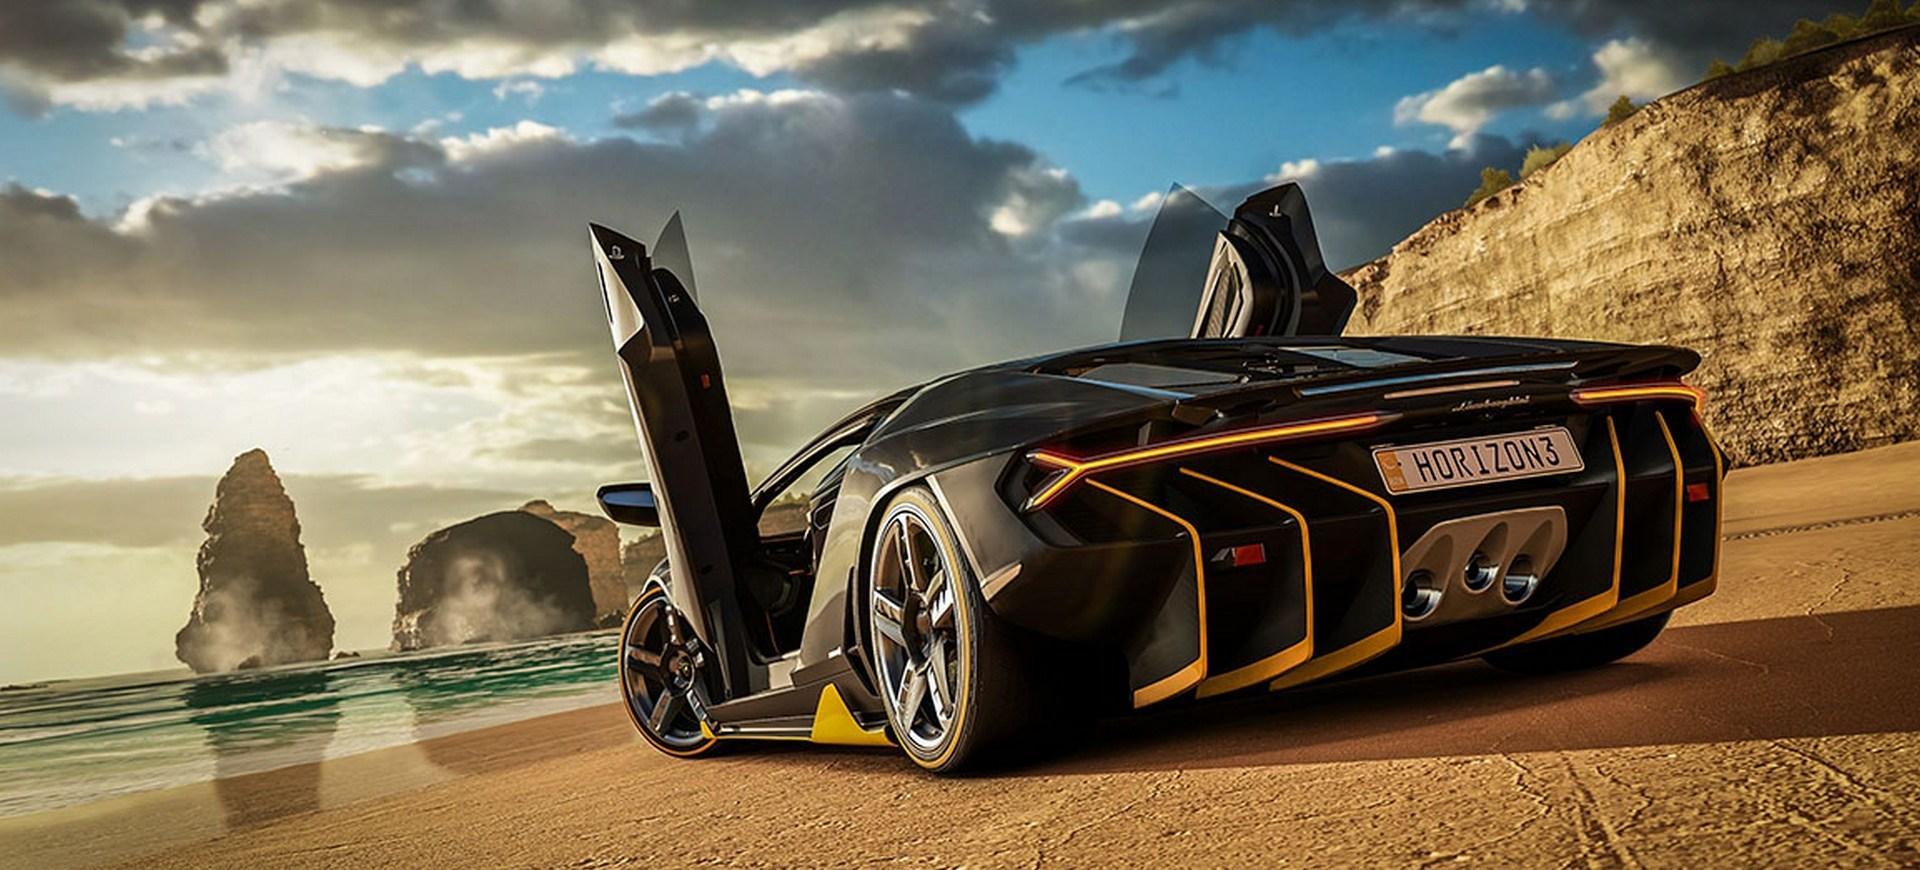 E3 2016   Forza Horizon 3 - Lễ hội thần gió - Giới Thiệu Game